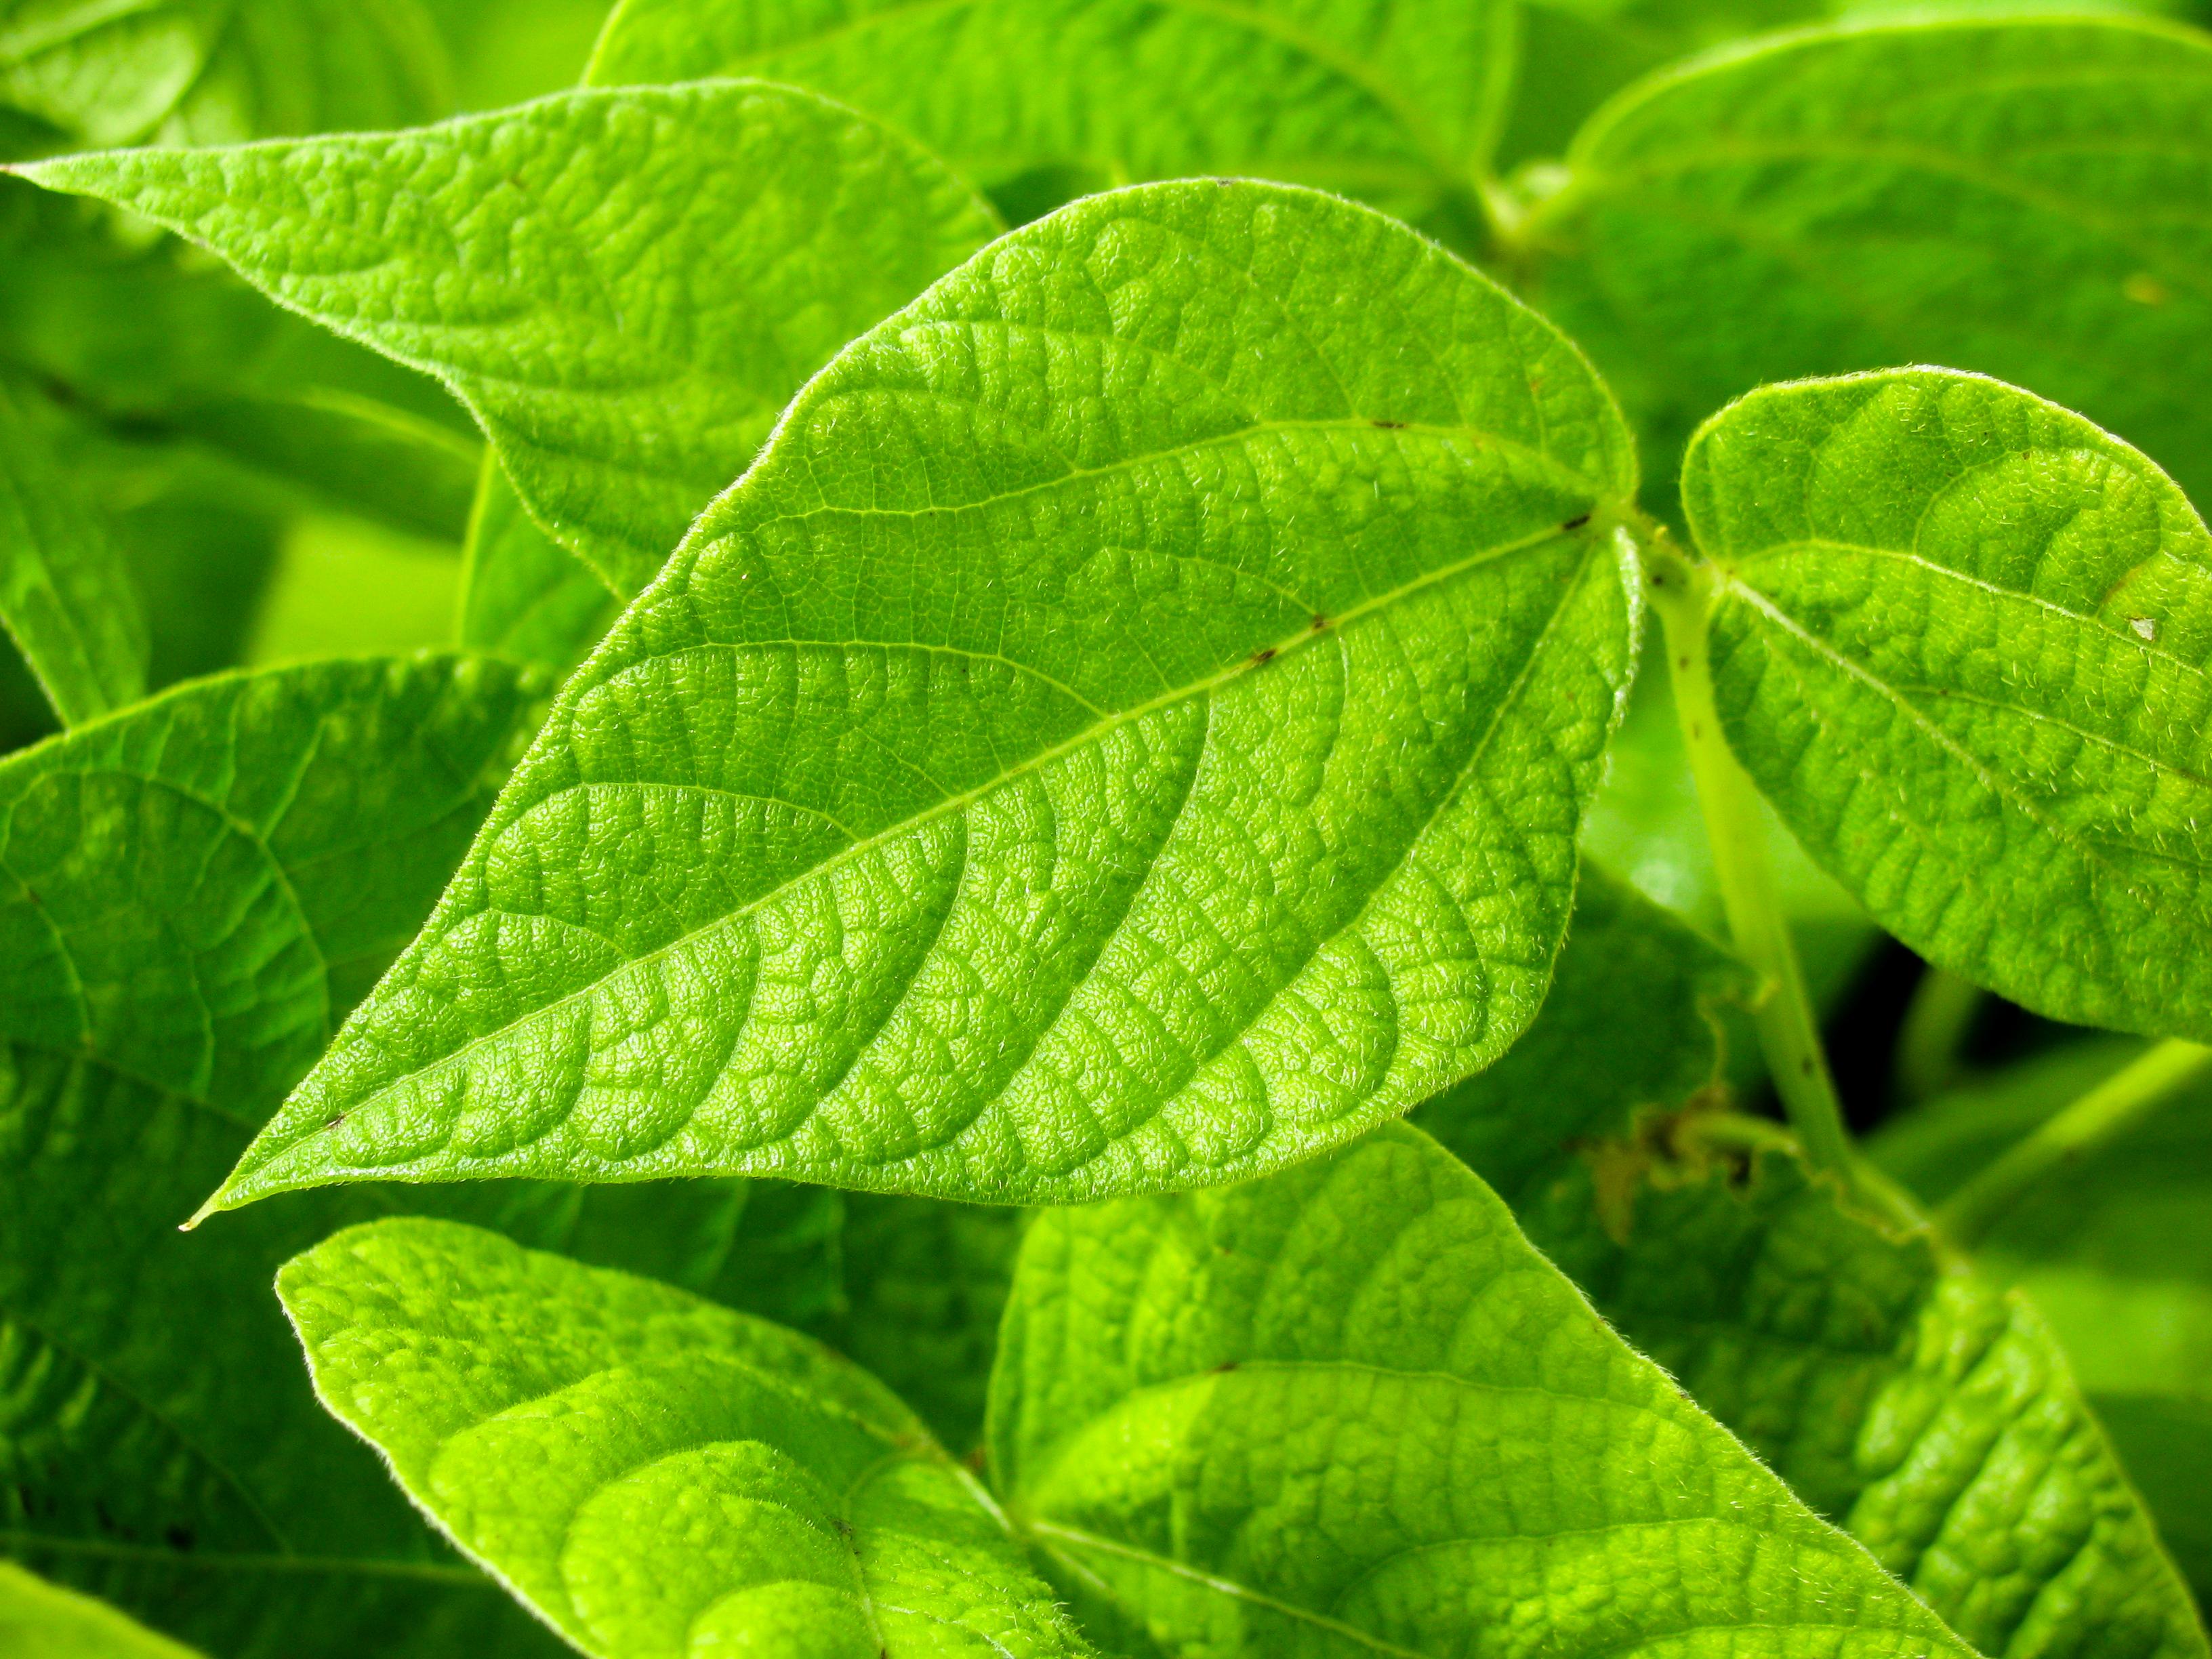 Green Plant Leaves, Background, Foliage, Green, Leaf, HQ Photo